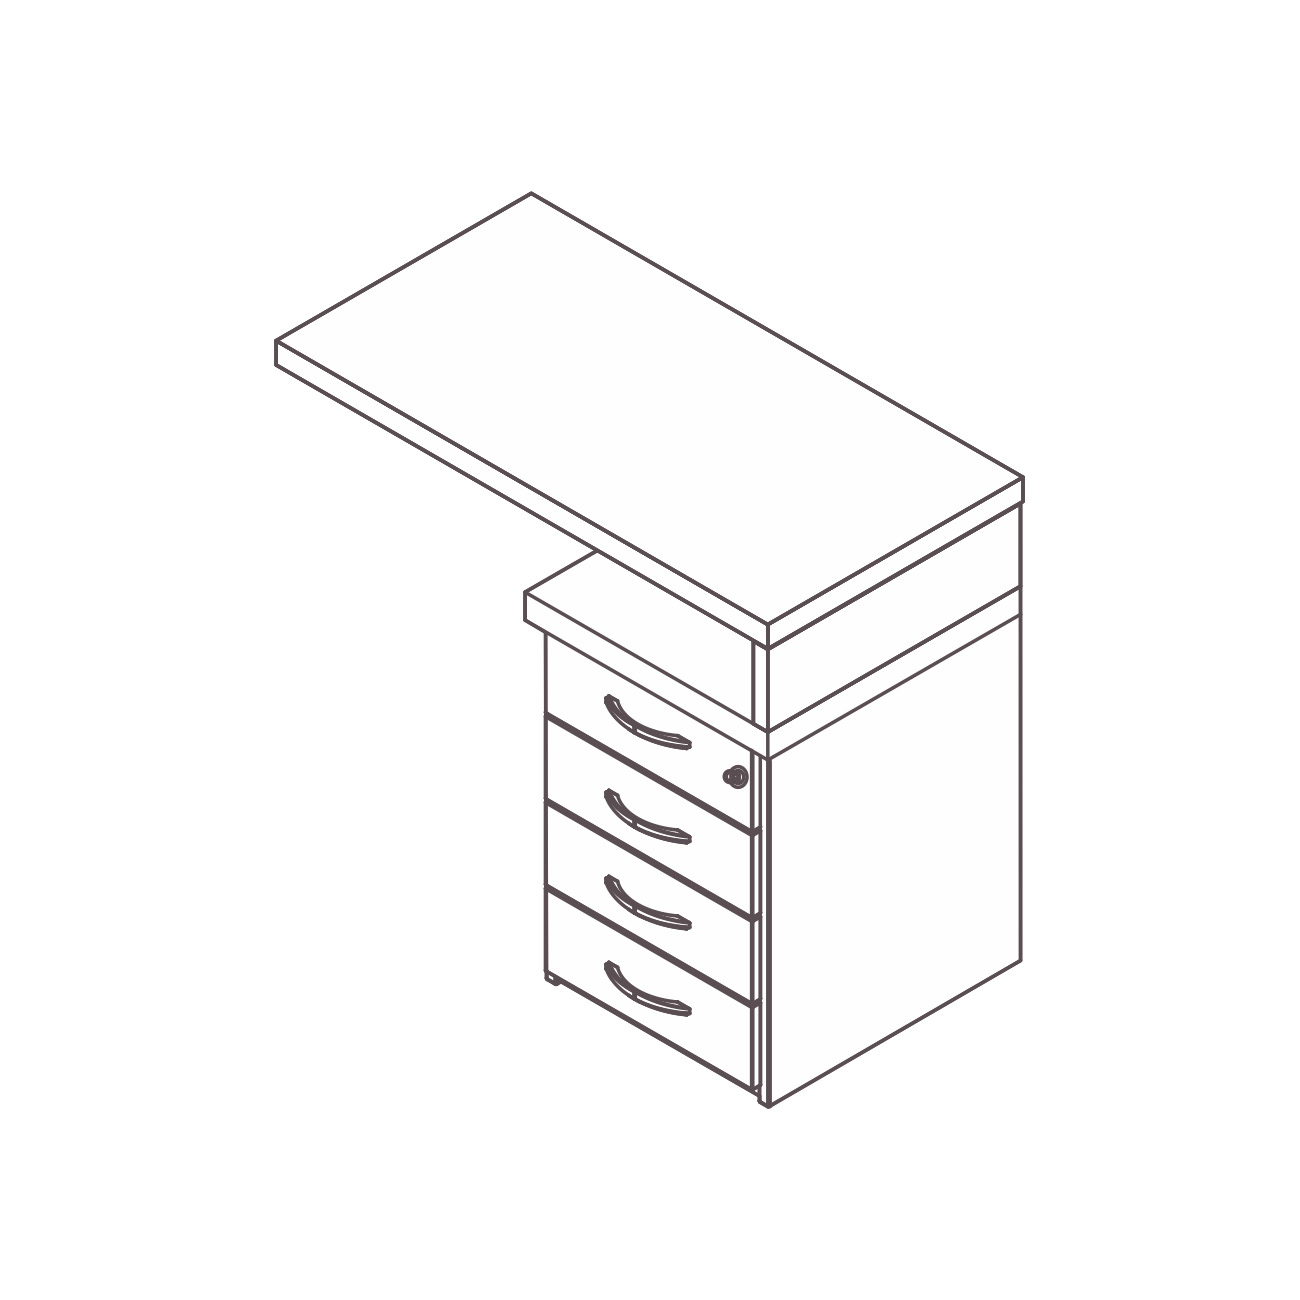 Mesa apoio gaveteiro 4 gavetas safira / AP30